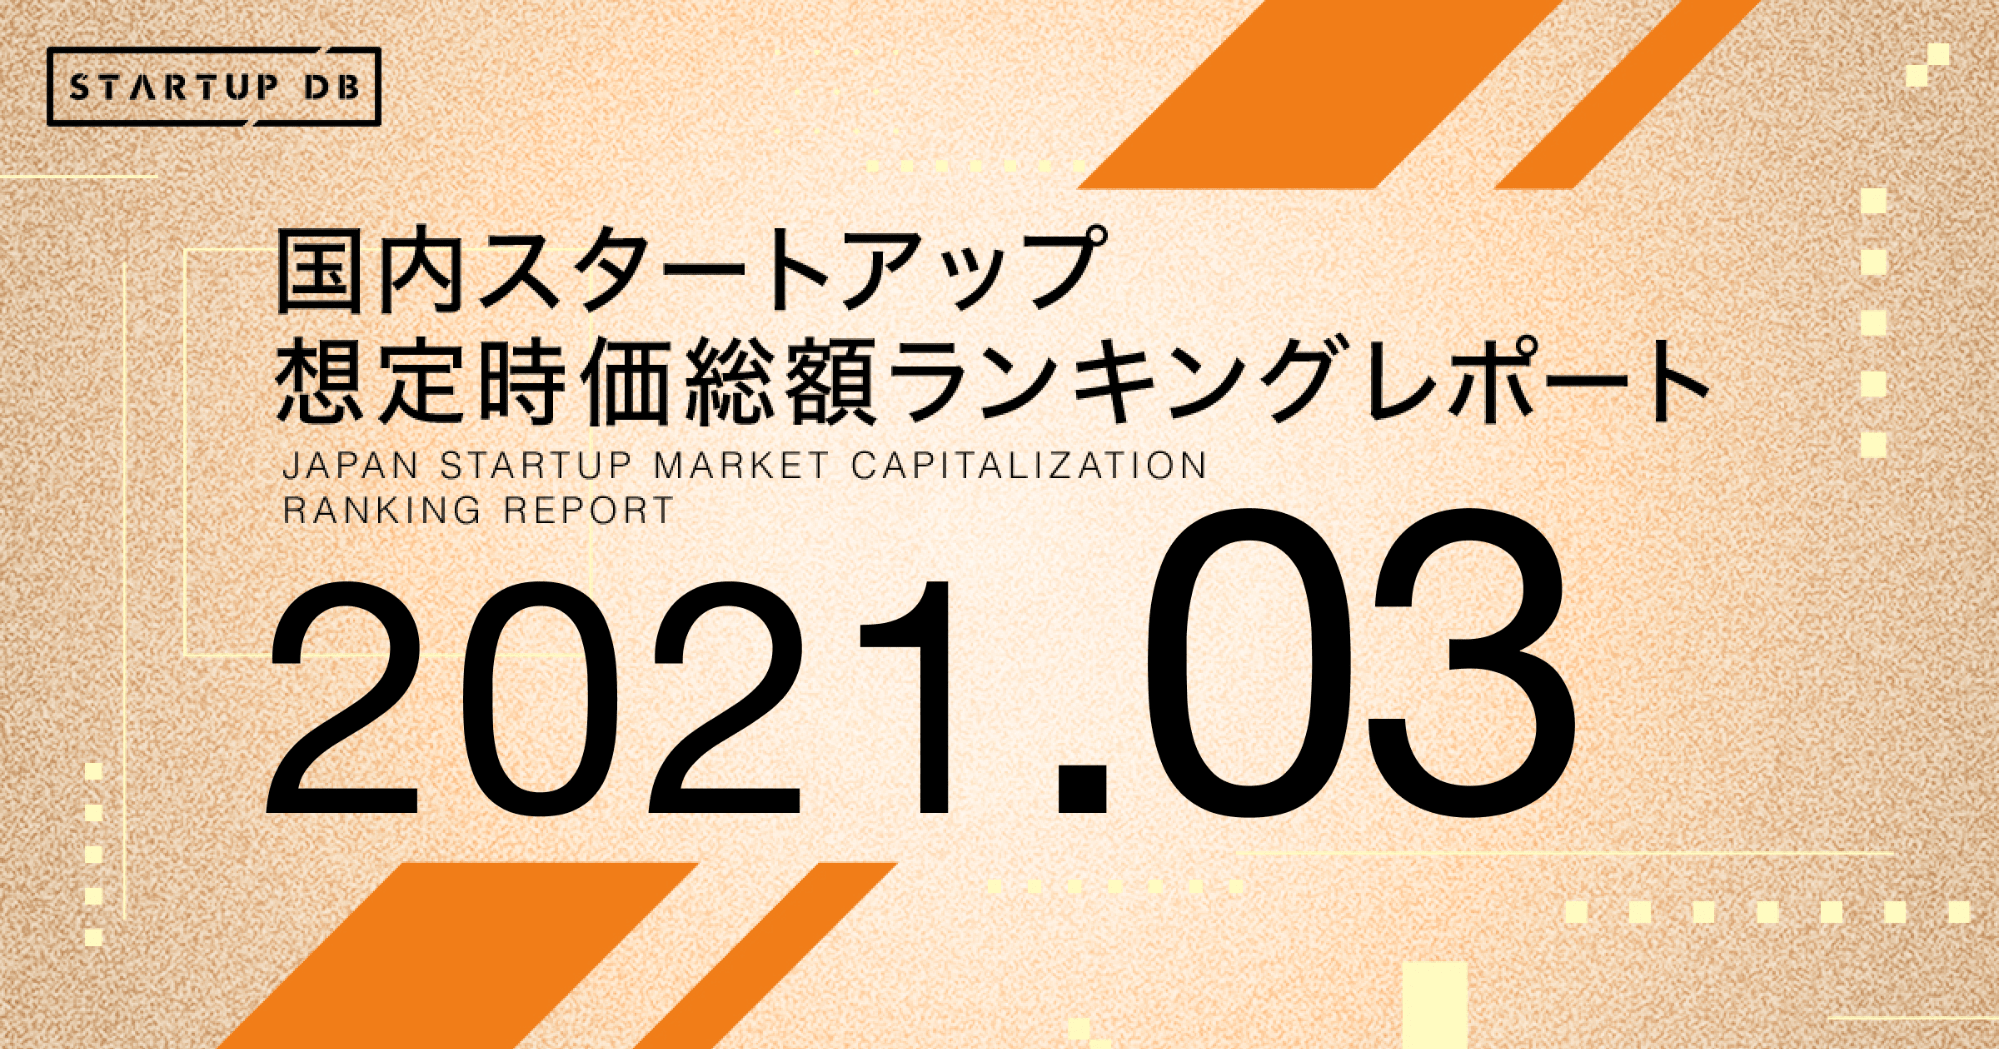 【STARTUP DB】調査結果 国内スタートアップ想定時価総額ランキング(2021年3月)